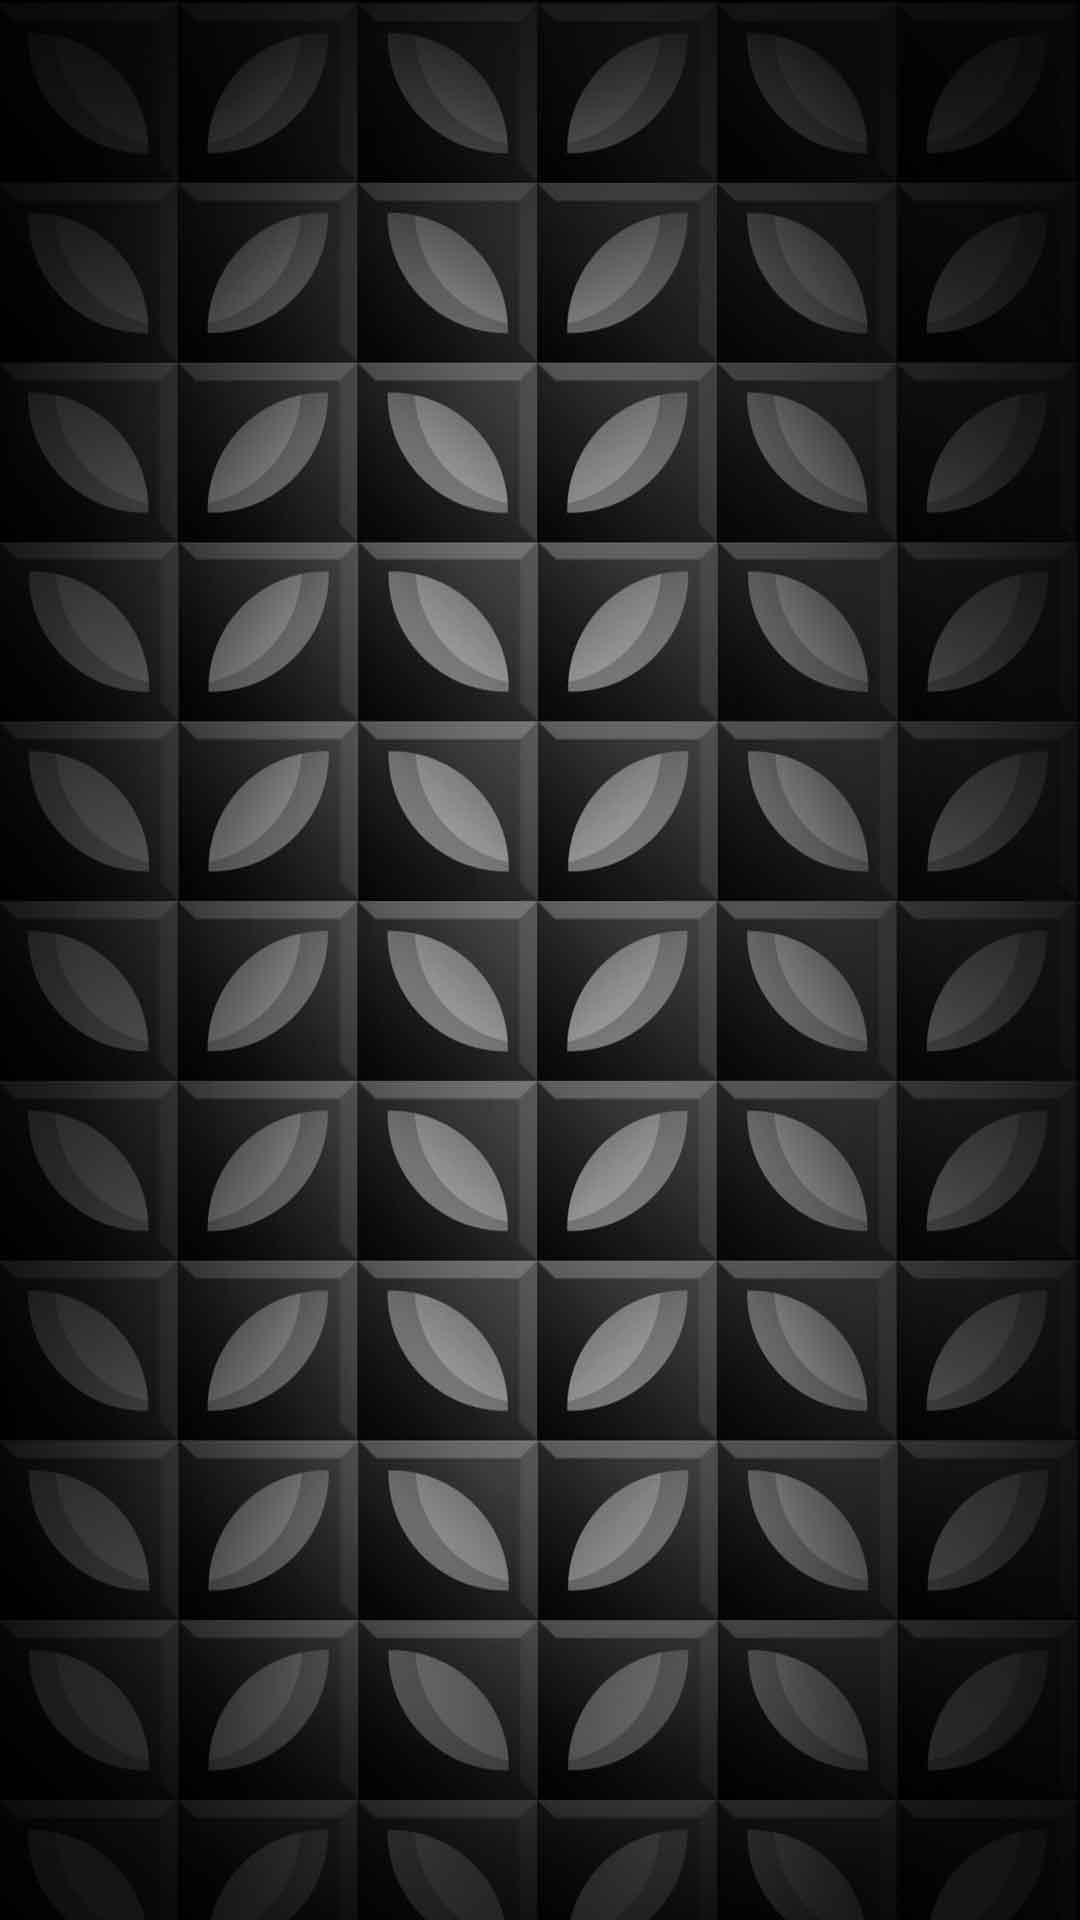 black wallpaper hd wallpaper